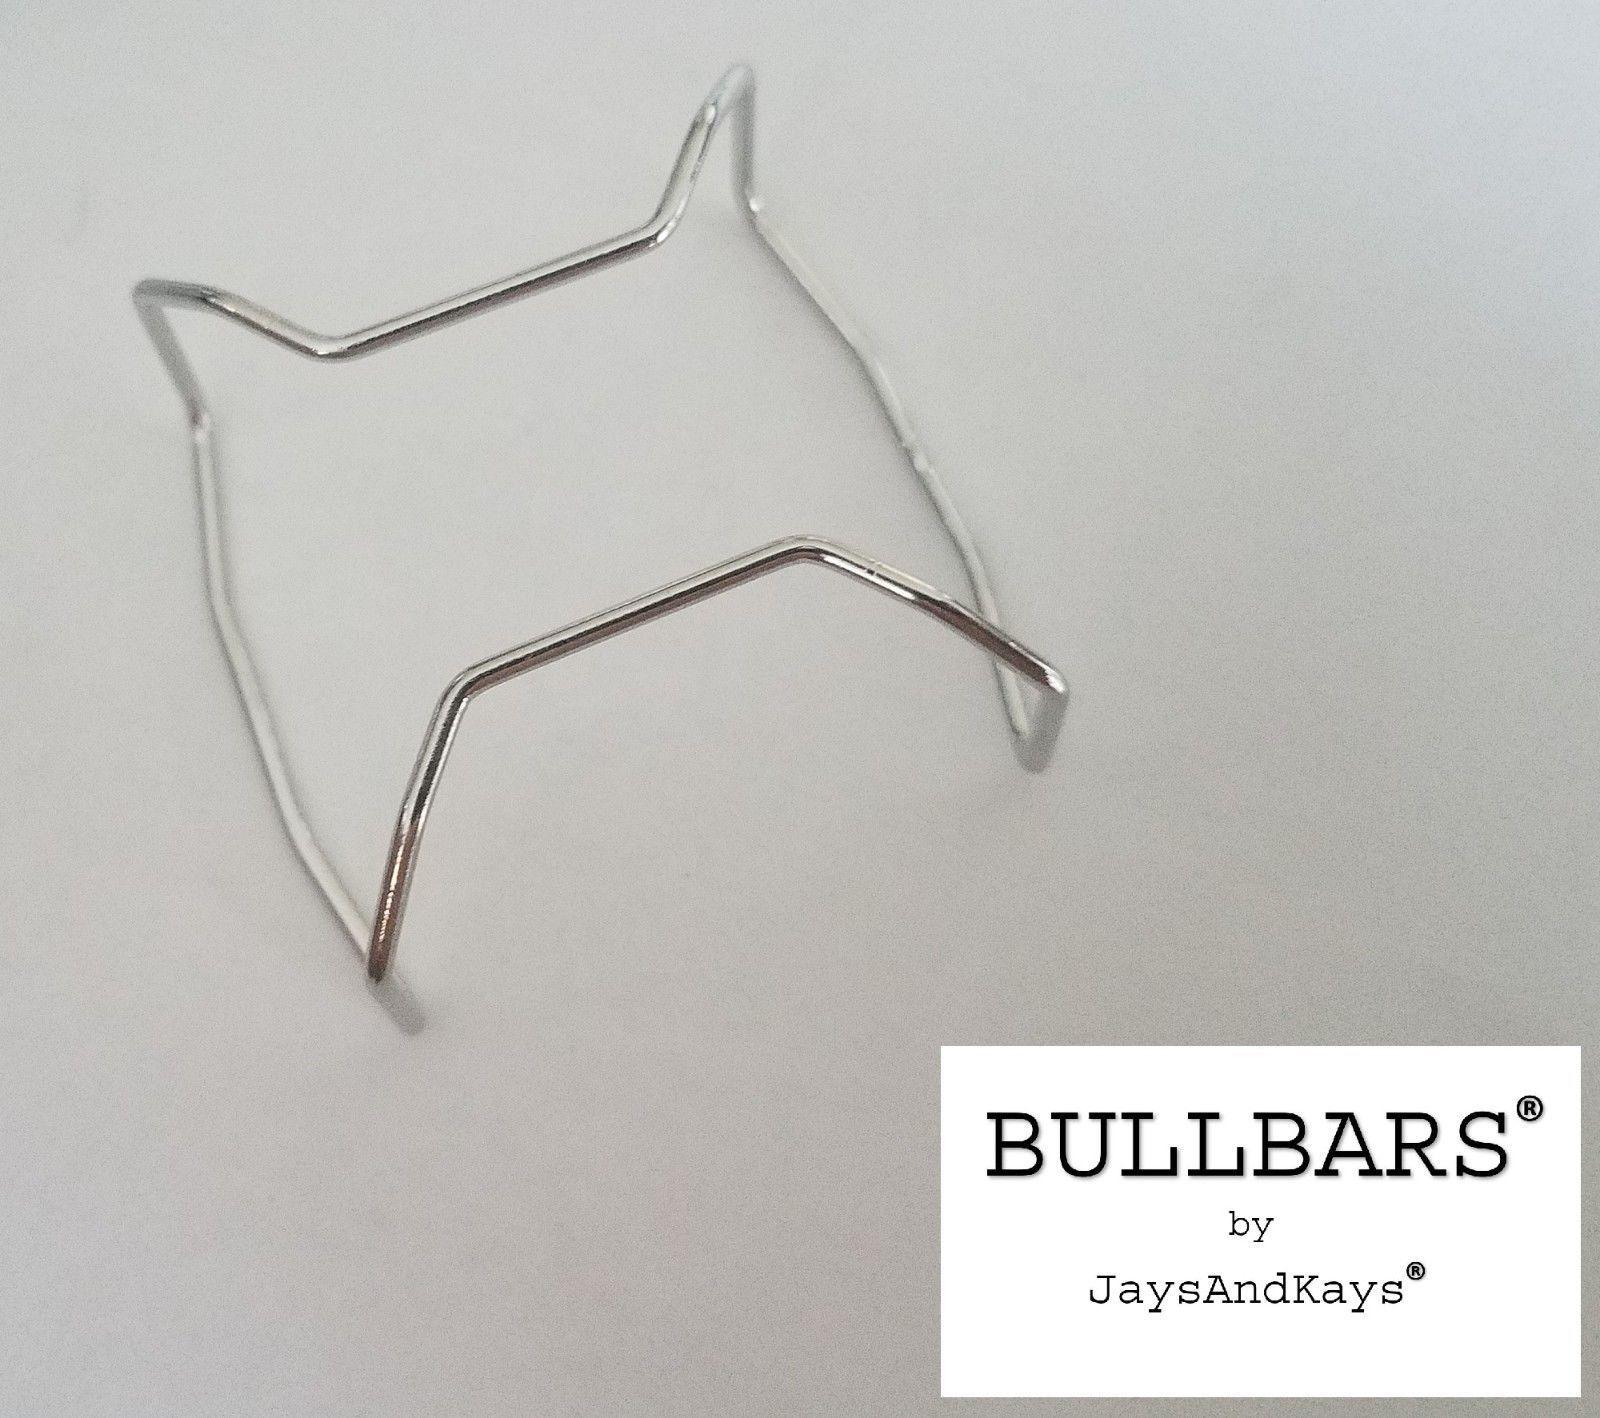 Protetor Metálico Bullbar JaysAndKays p/ Relógio G-Shock G9100 Gulfman